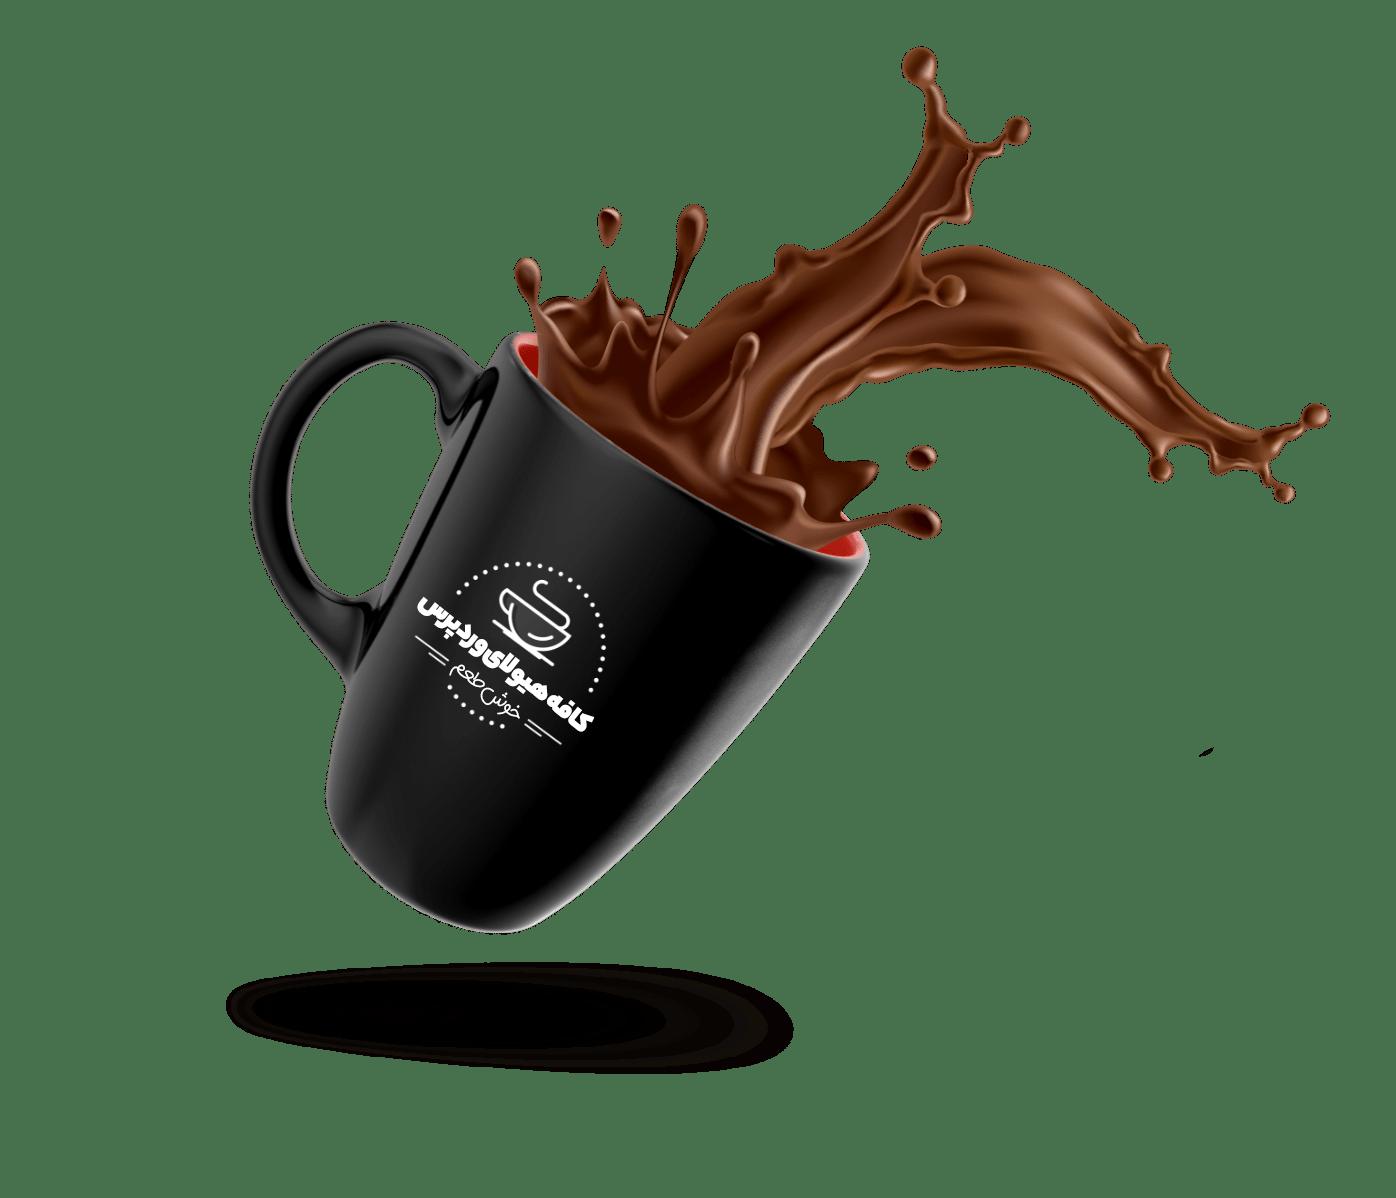 Promotional_Coffee_Mug_Mockup_-_Mug_1_Black_Side.M152-min